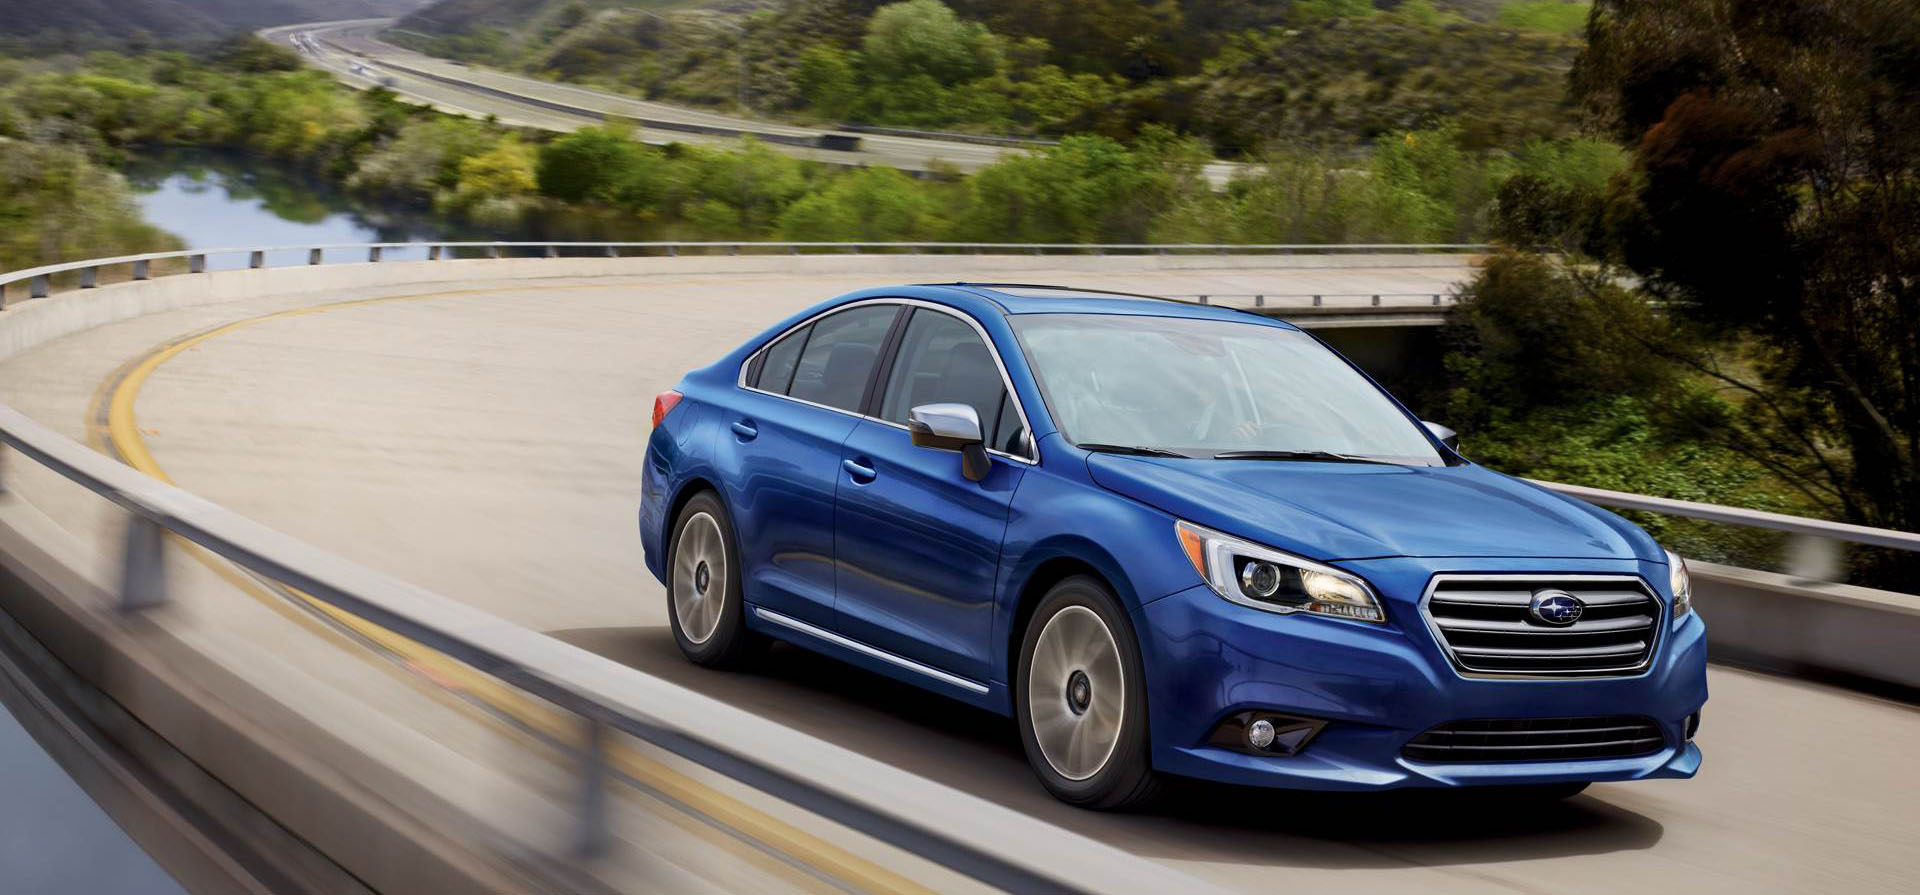 Subaru Dealers Nj >> New Subaru Dealer In Woodland